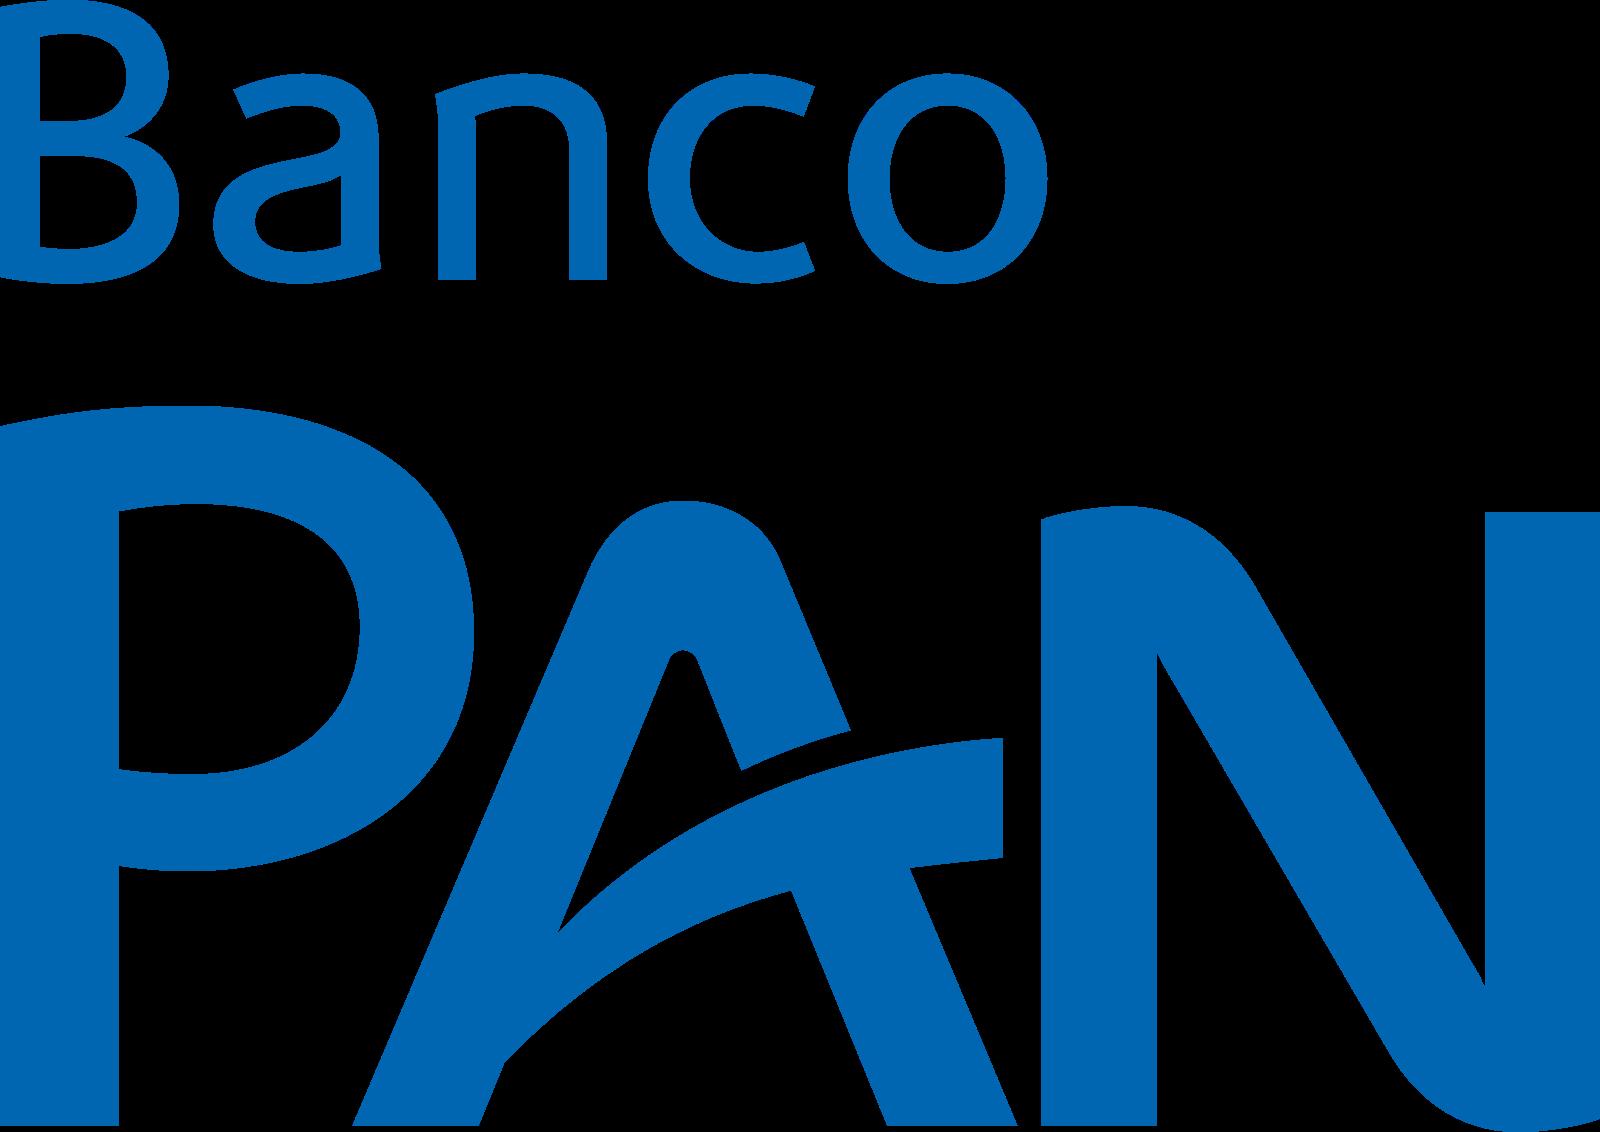 banco-pan-logo-2